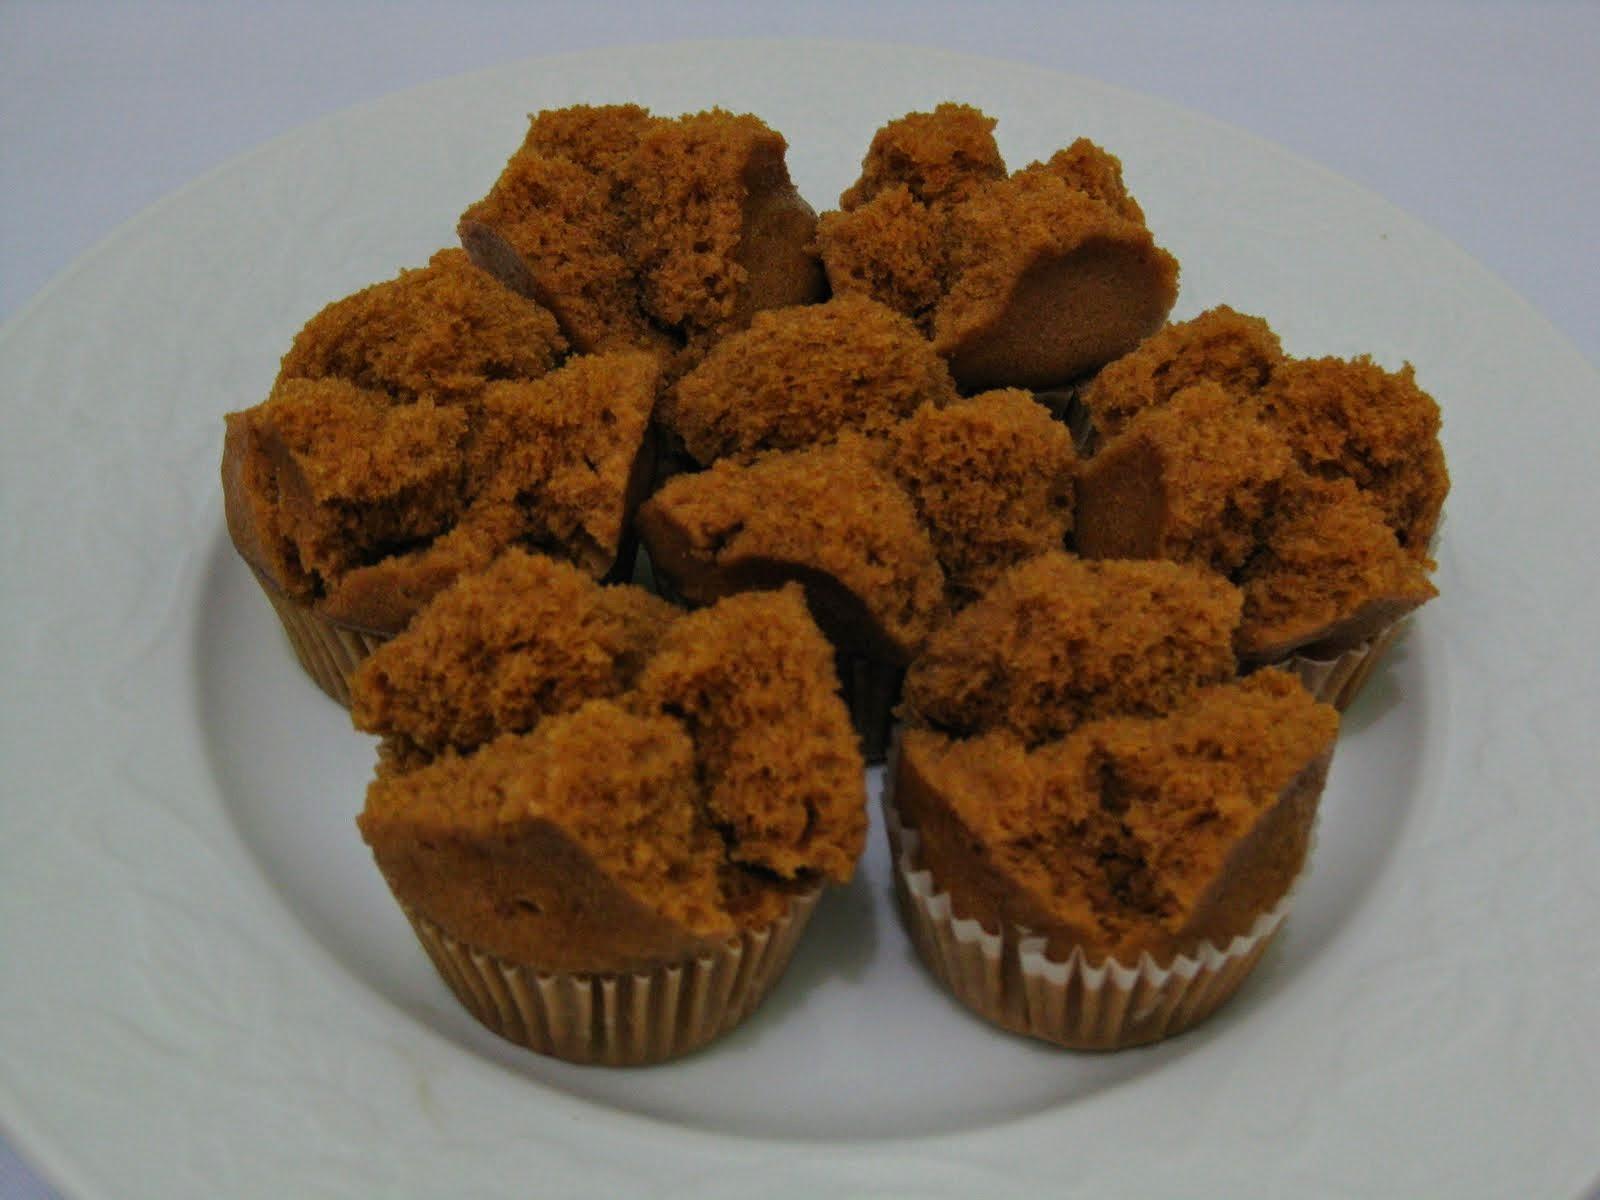 Resep Membuat Bolu Kukus Gula Merah - Aneka Resep Indonesia